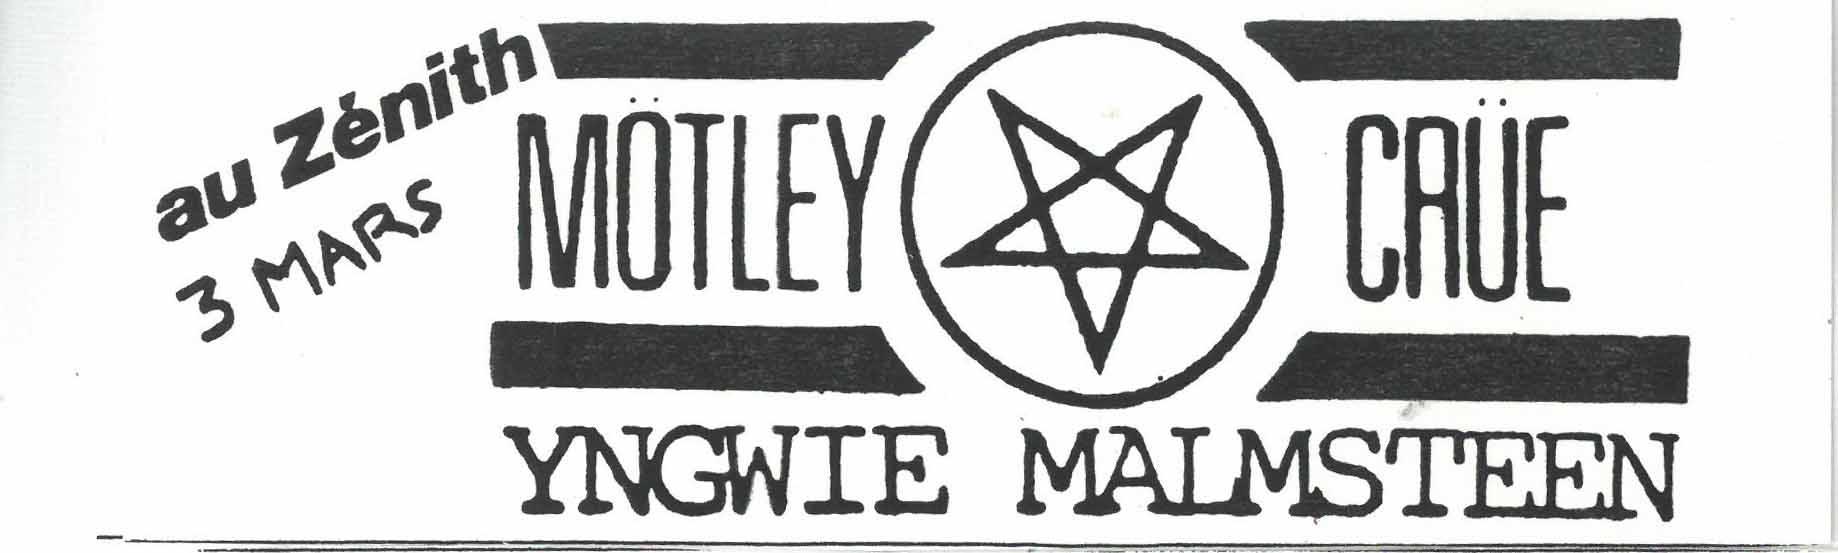 "3 mars 1986 Motley Crue, Yngwie Malmsteen à Paris ""Zenith"""